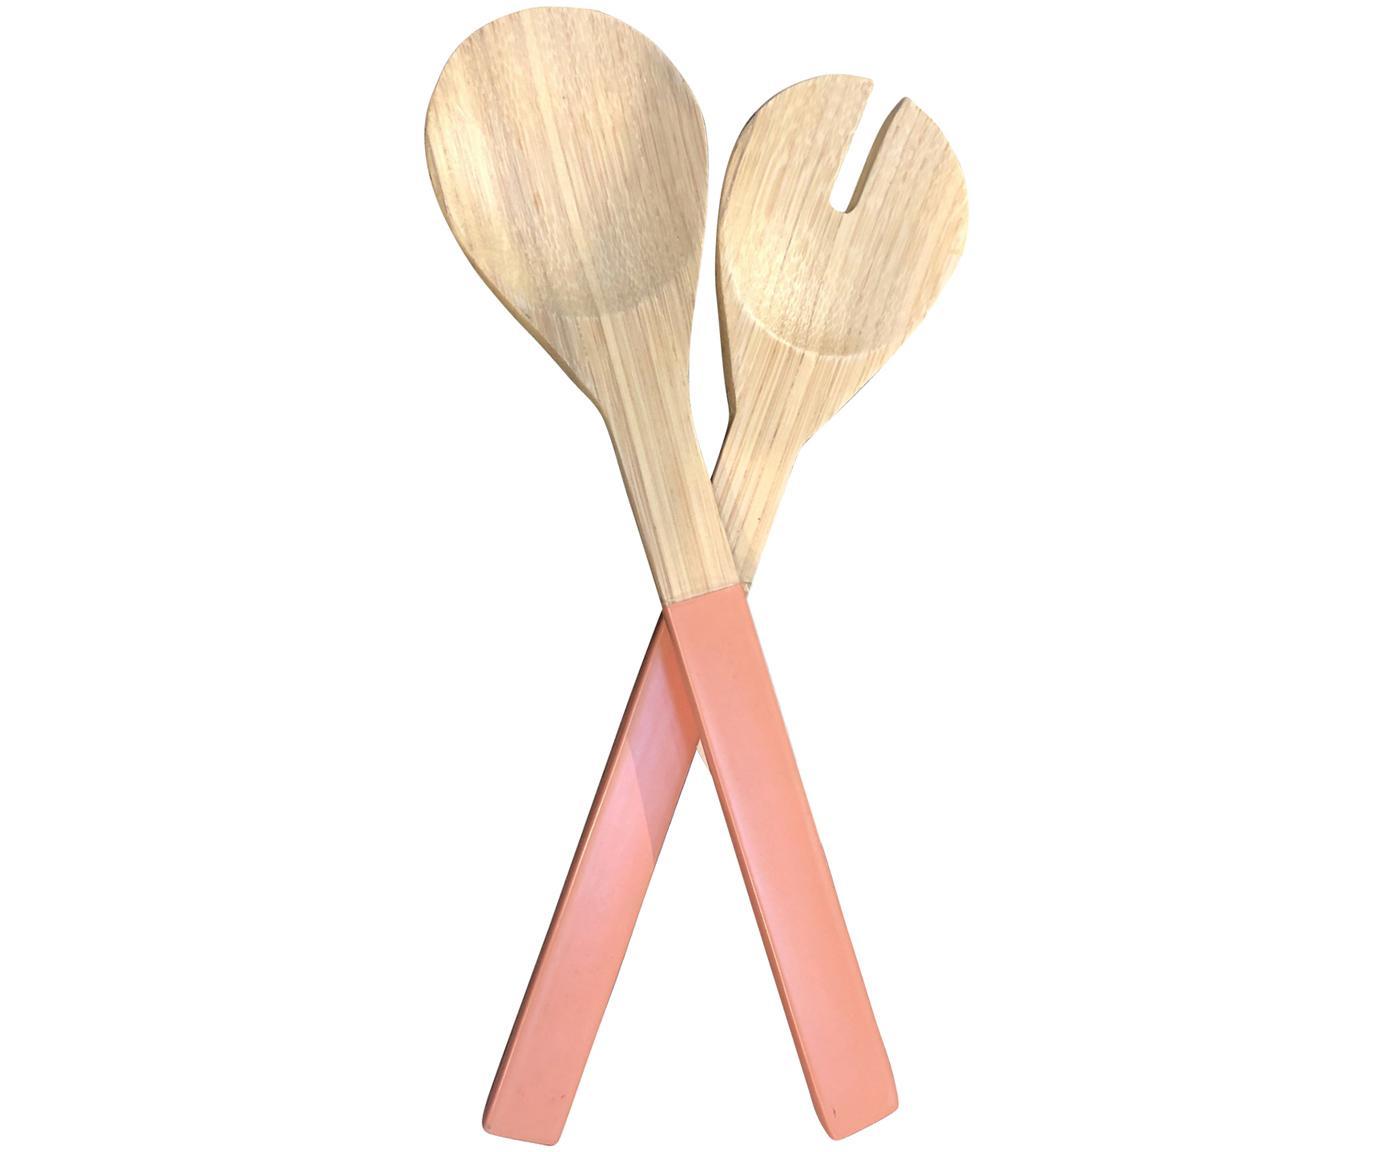 Bambus Salatbesteck Tina mit rosa Griffen, 2er-Set, Bambus, Rosa, L 30 cm